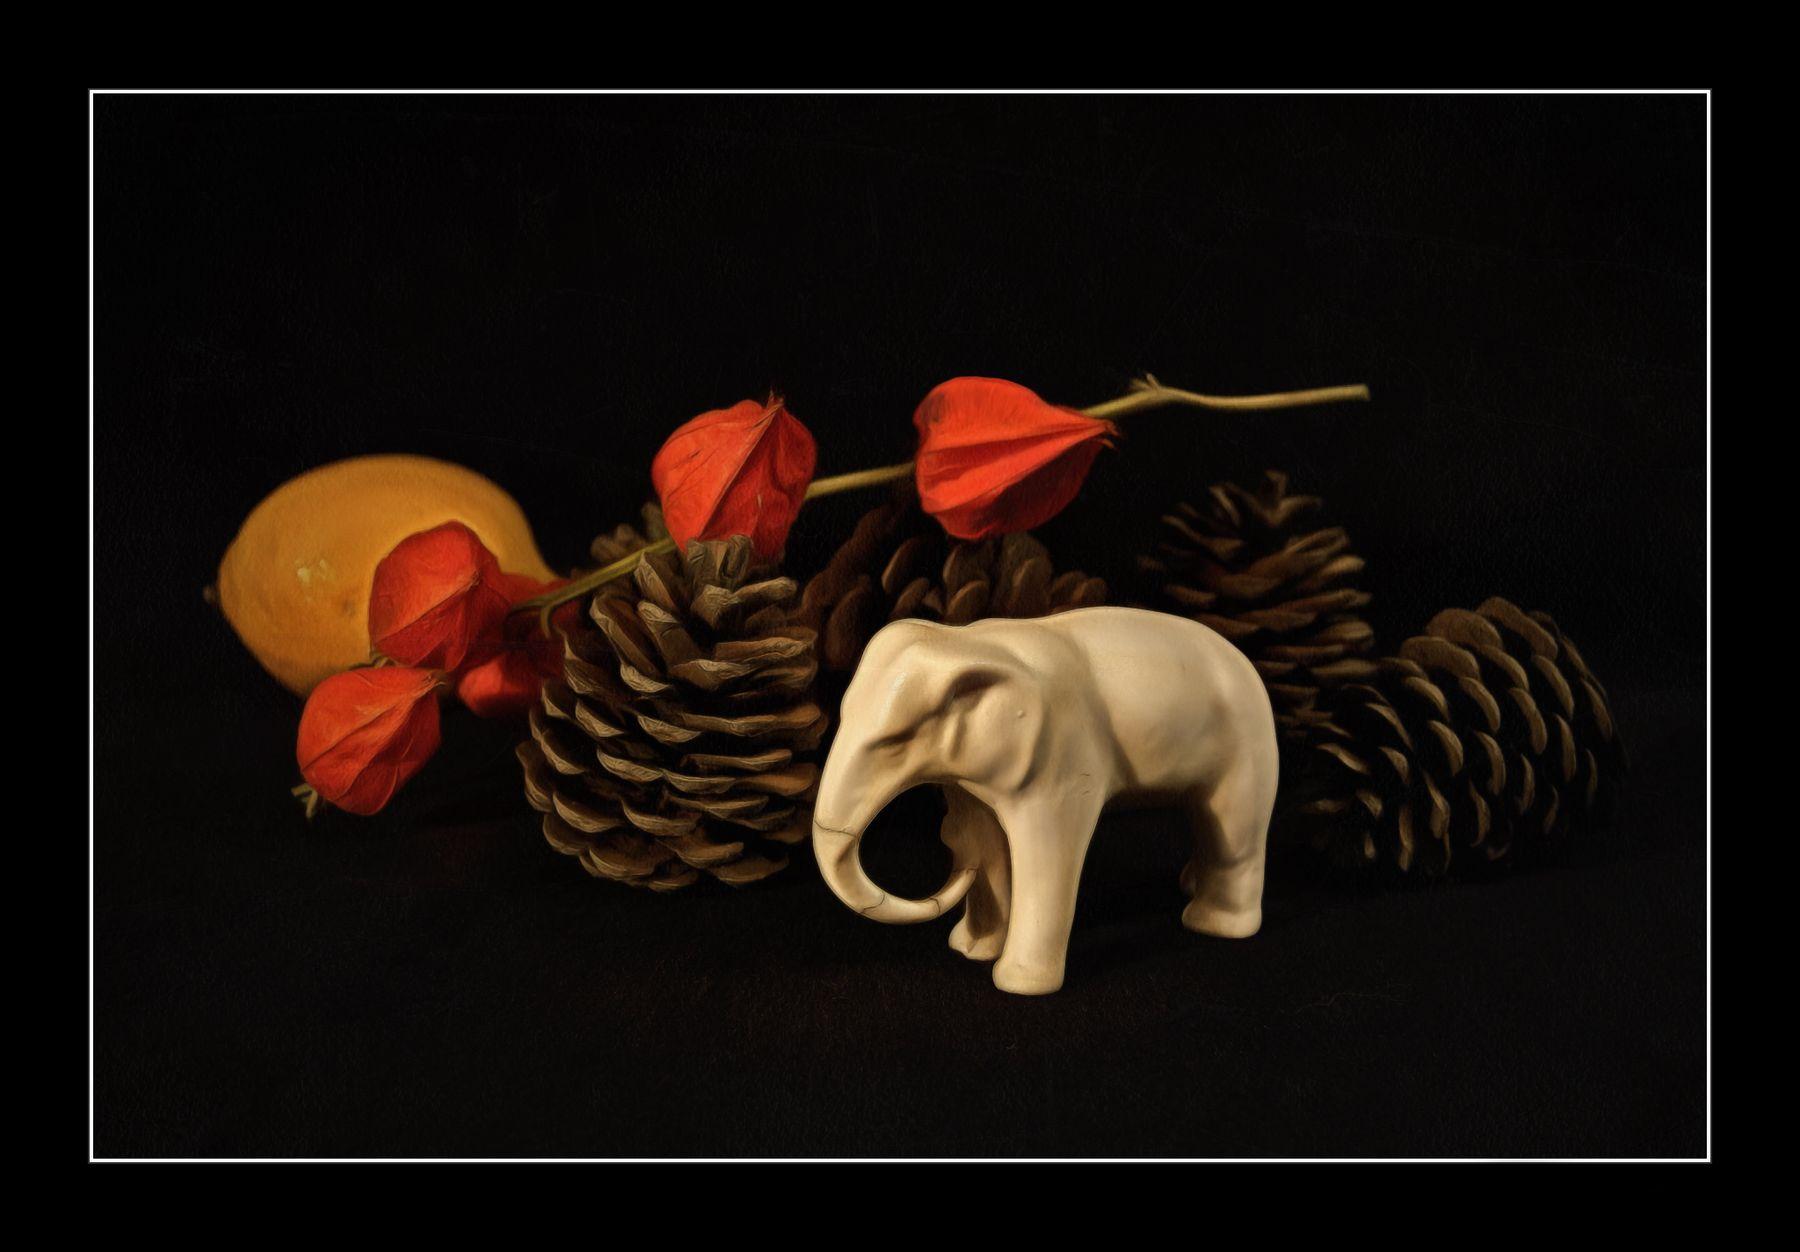 Натюрморт со старым слоником натюрморт